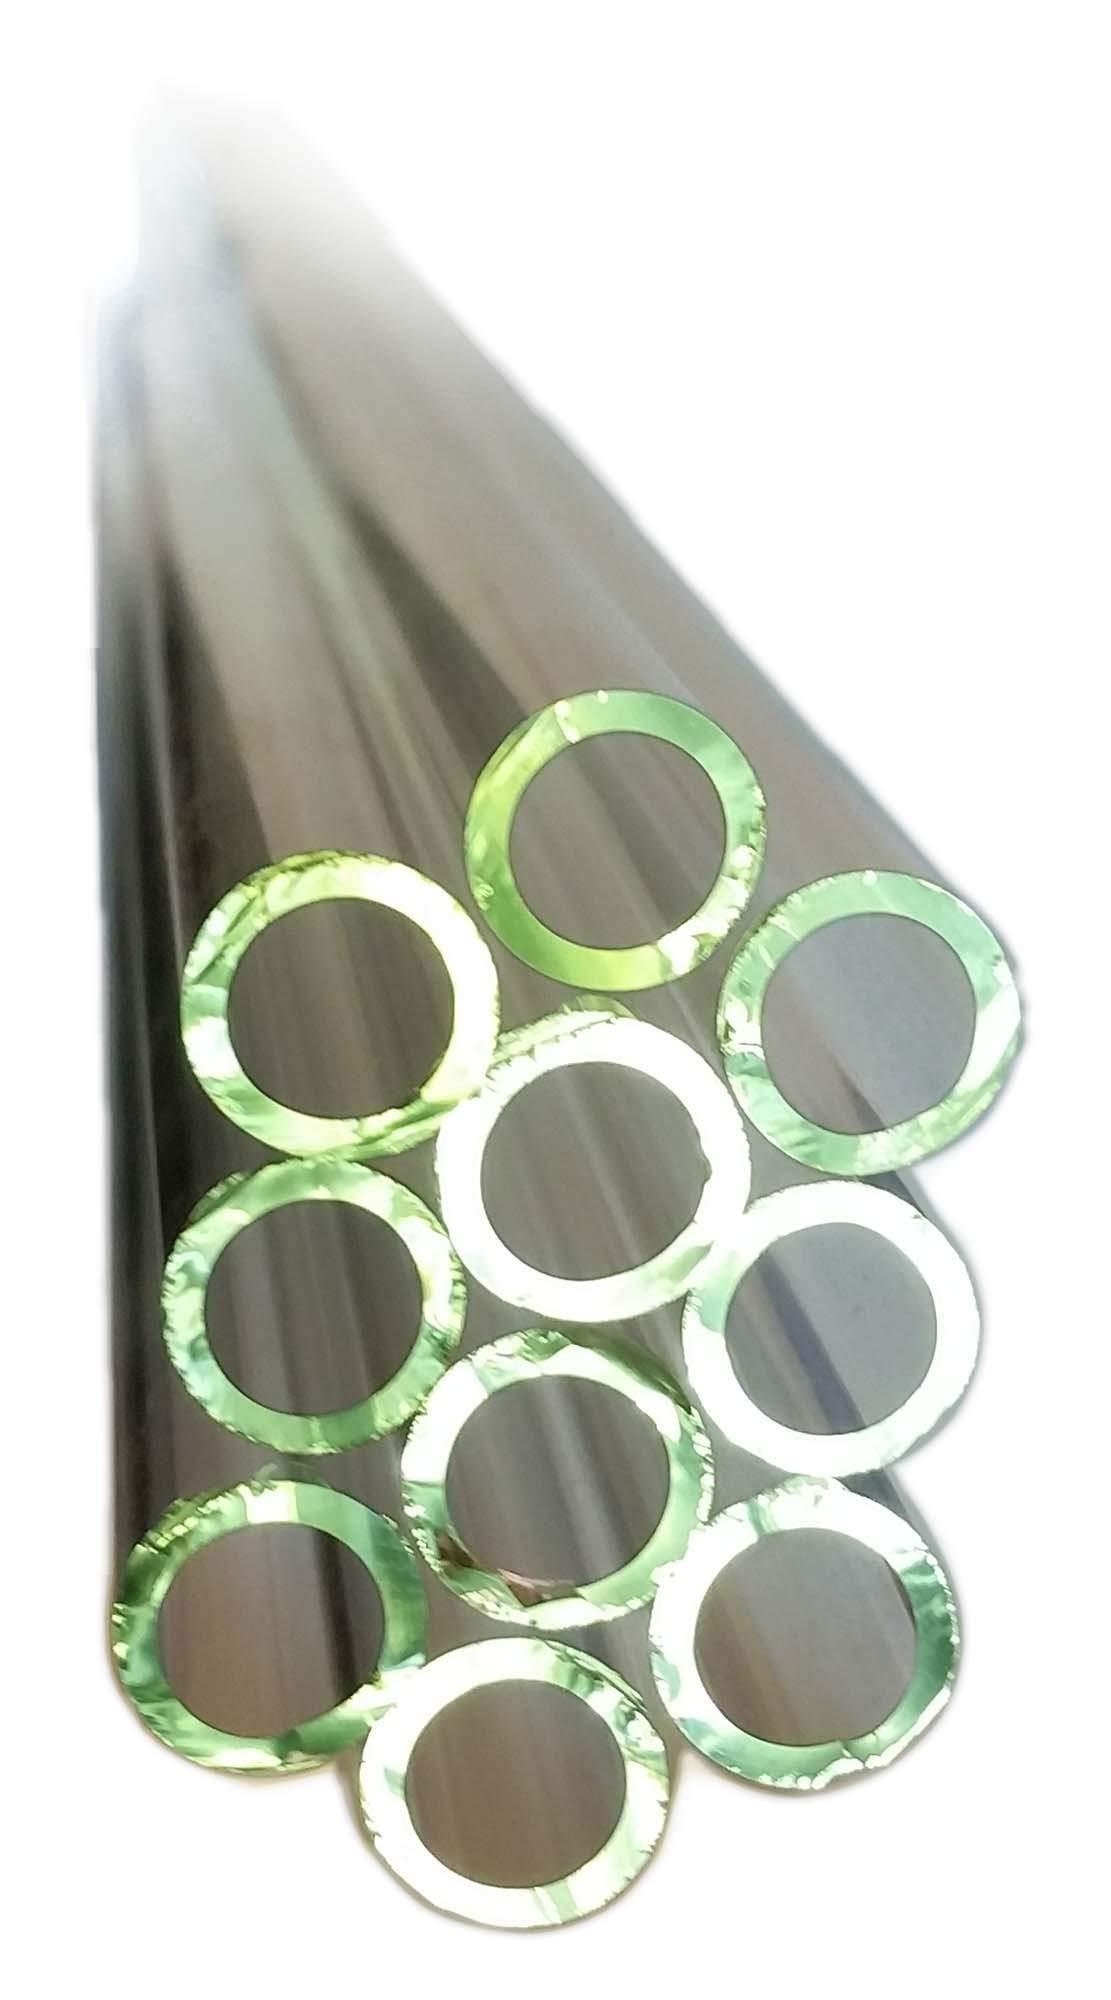 GSC International 8MMBT-48-1-5 Borosilicate Glass Tubing, 8mm Diameter, 48'' Long (5-Pound Pack)